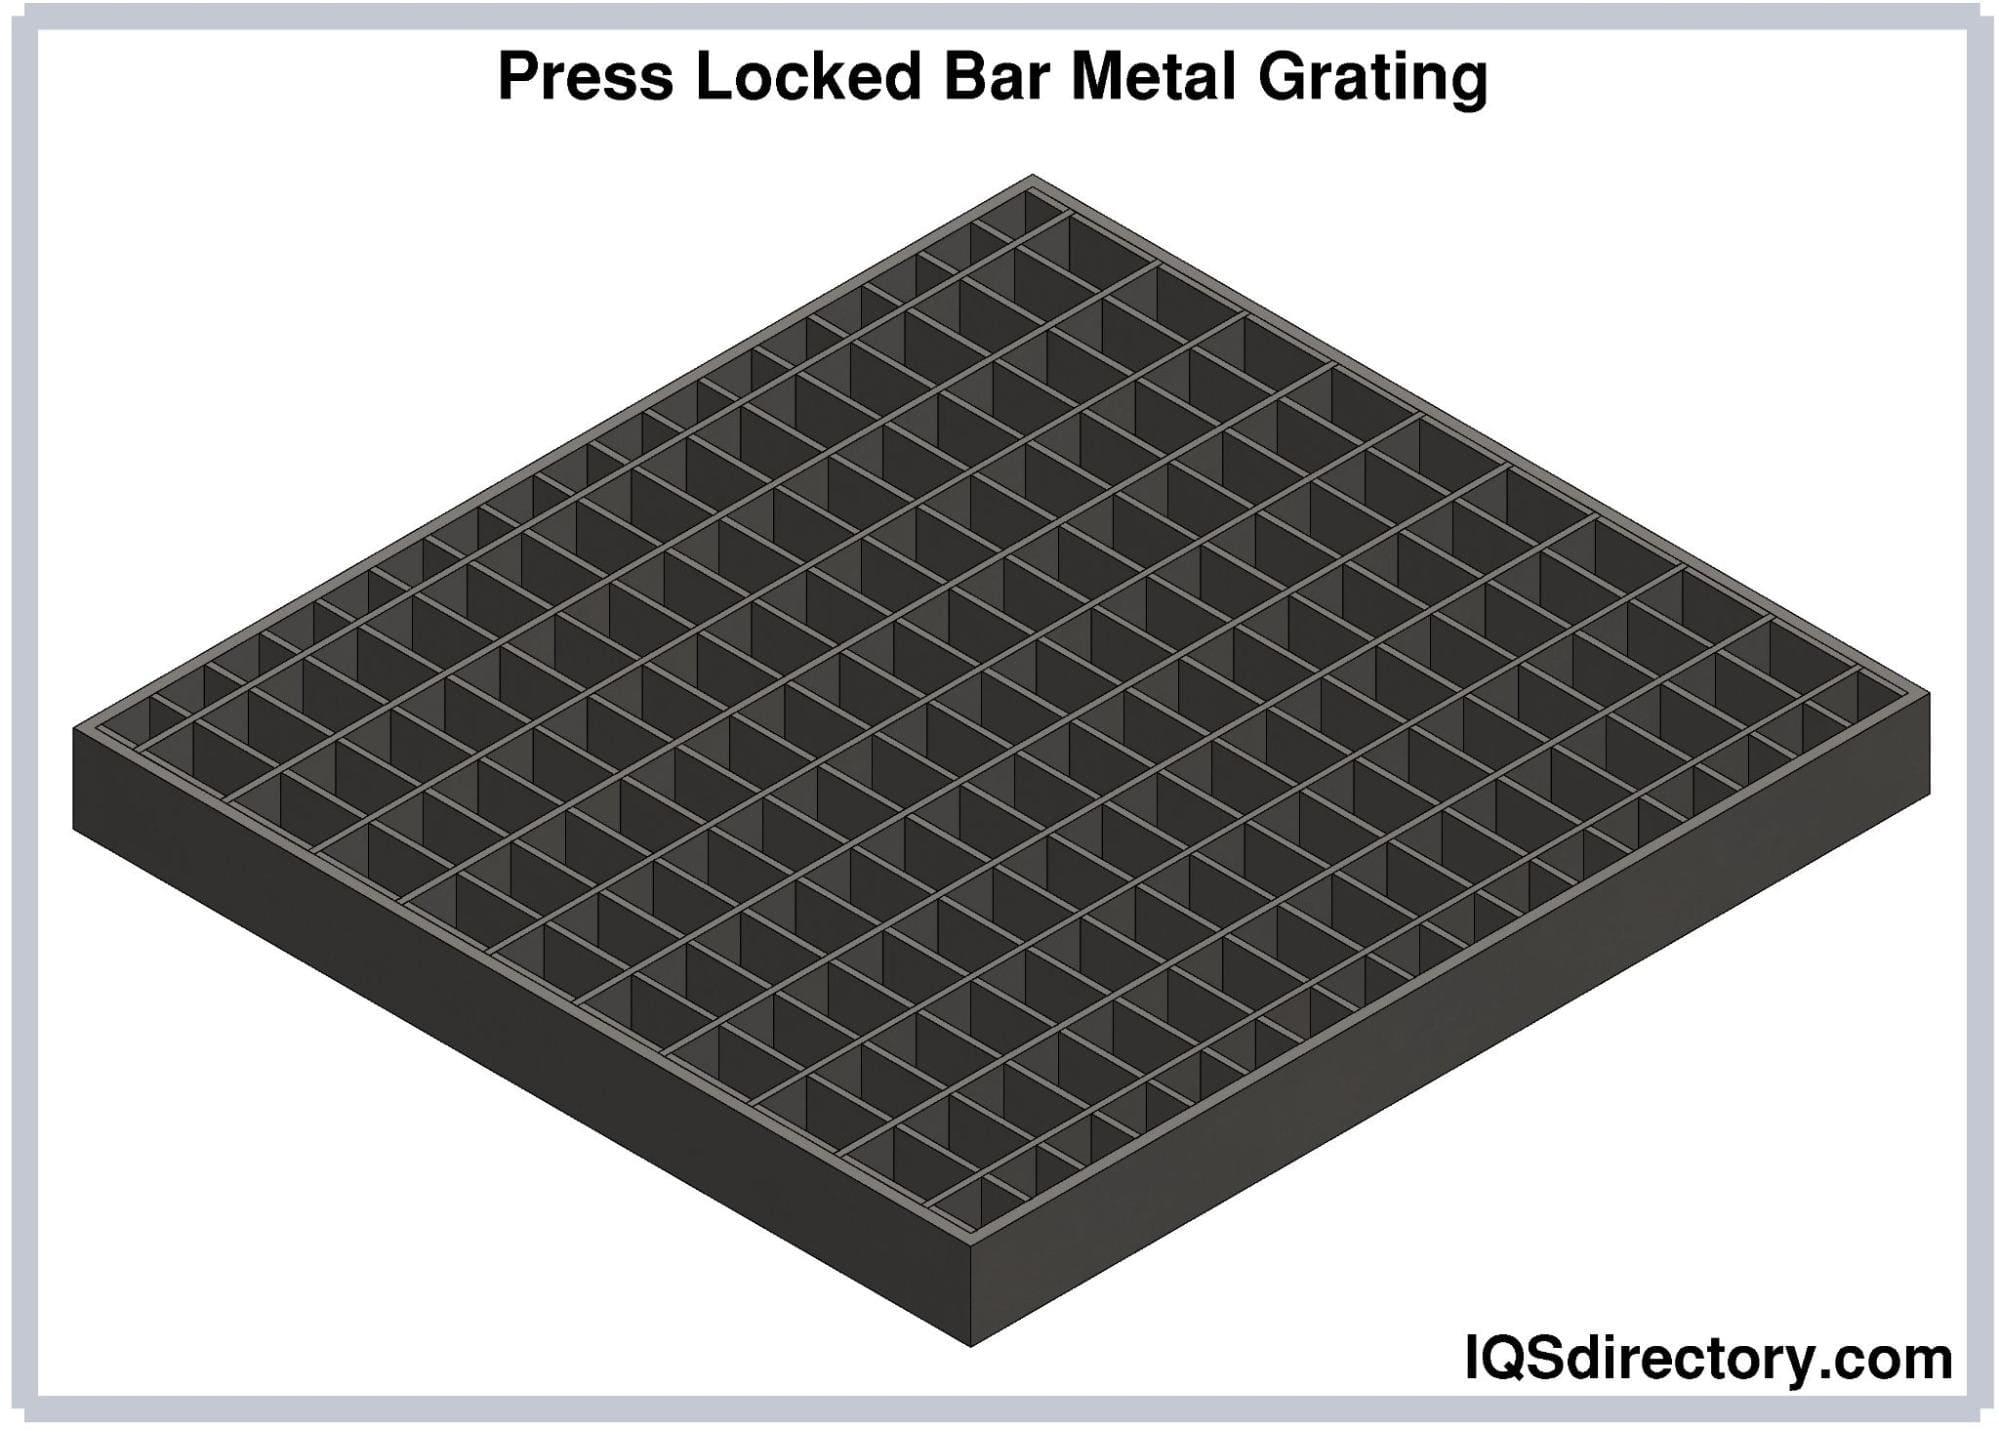 Press Locked Bar Metal Grating